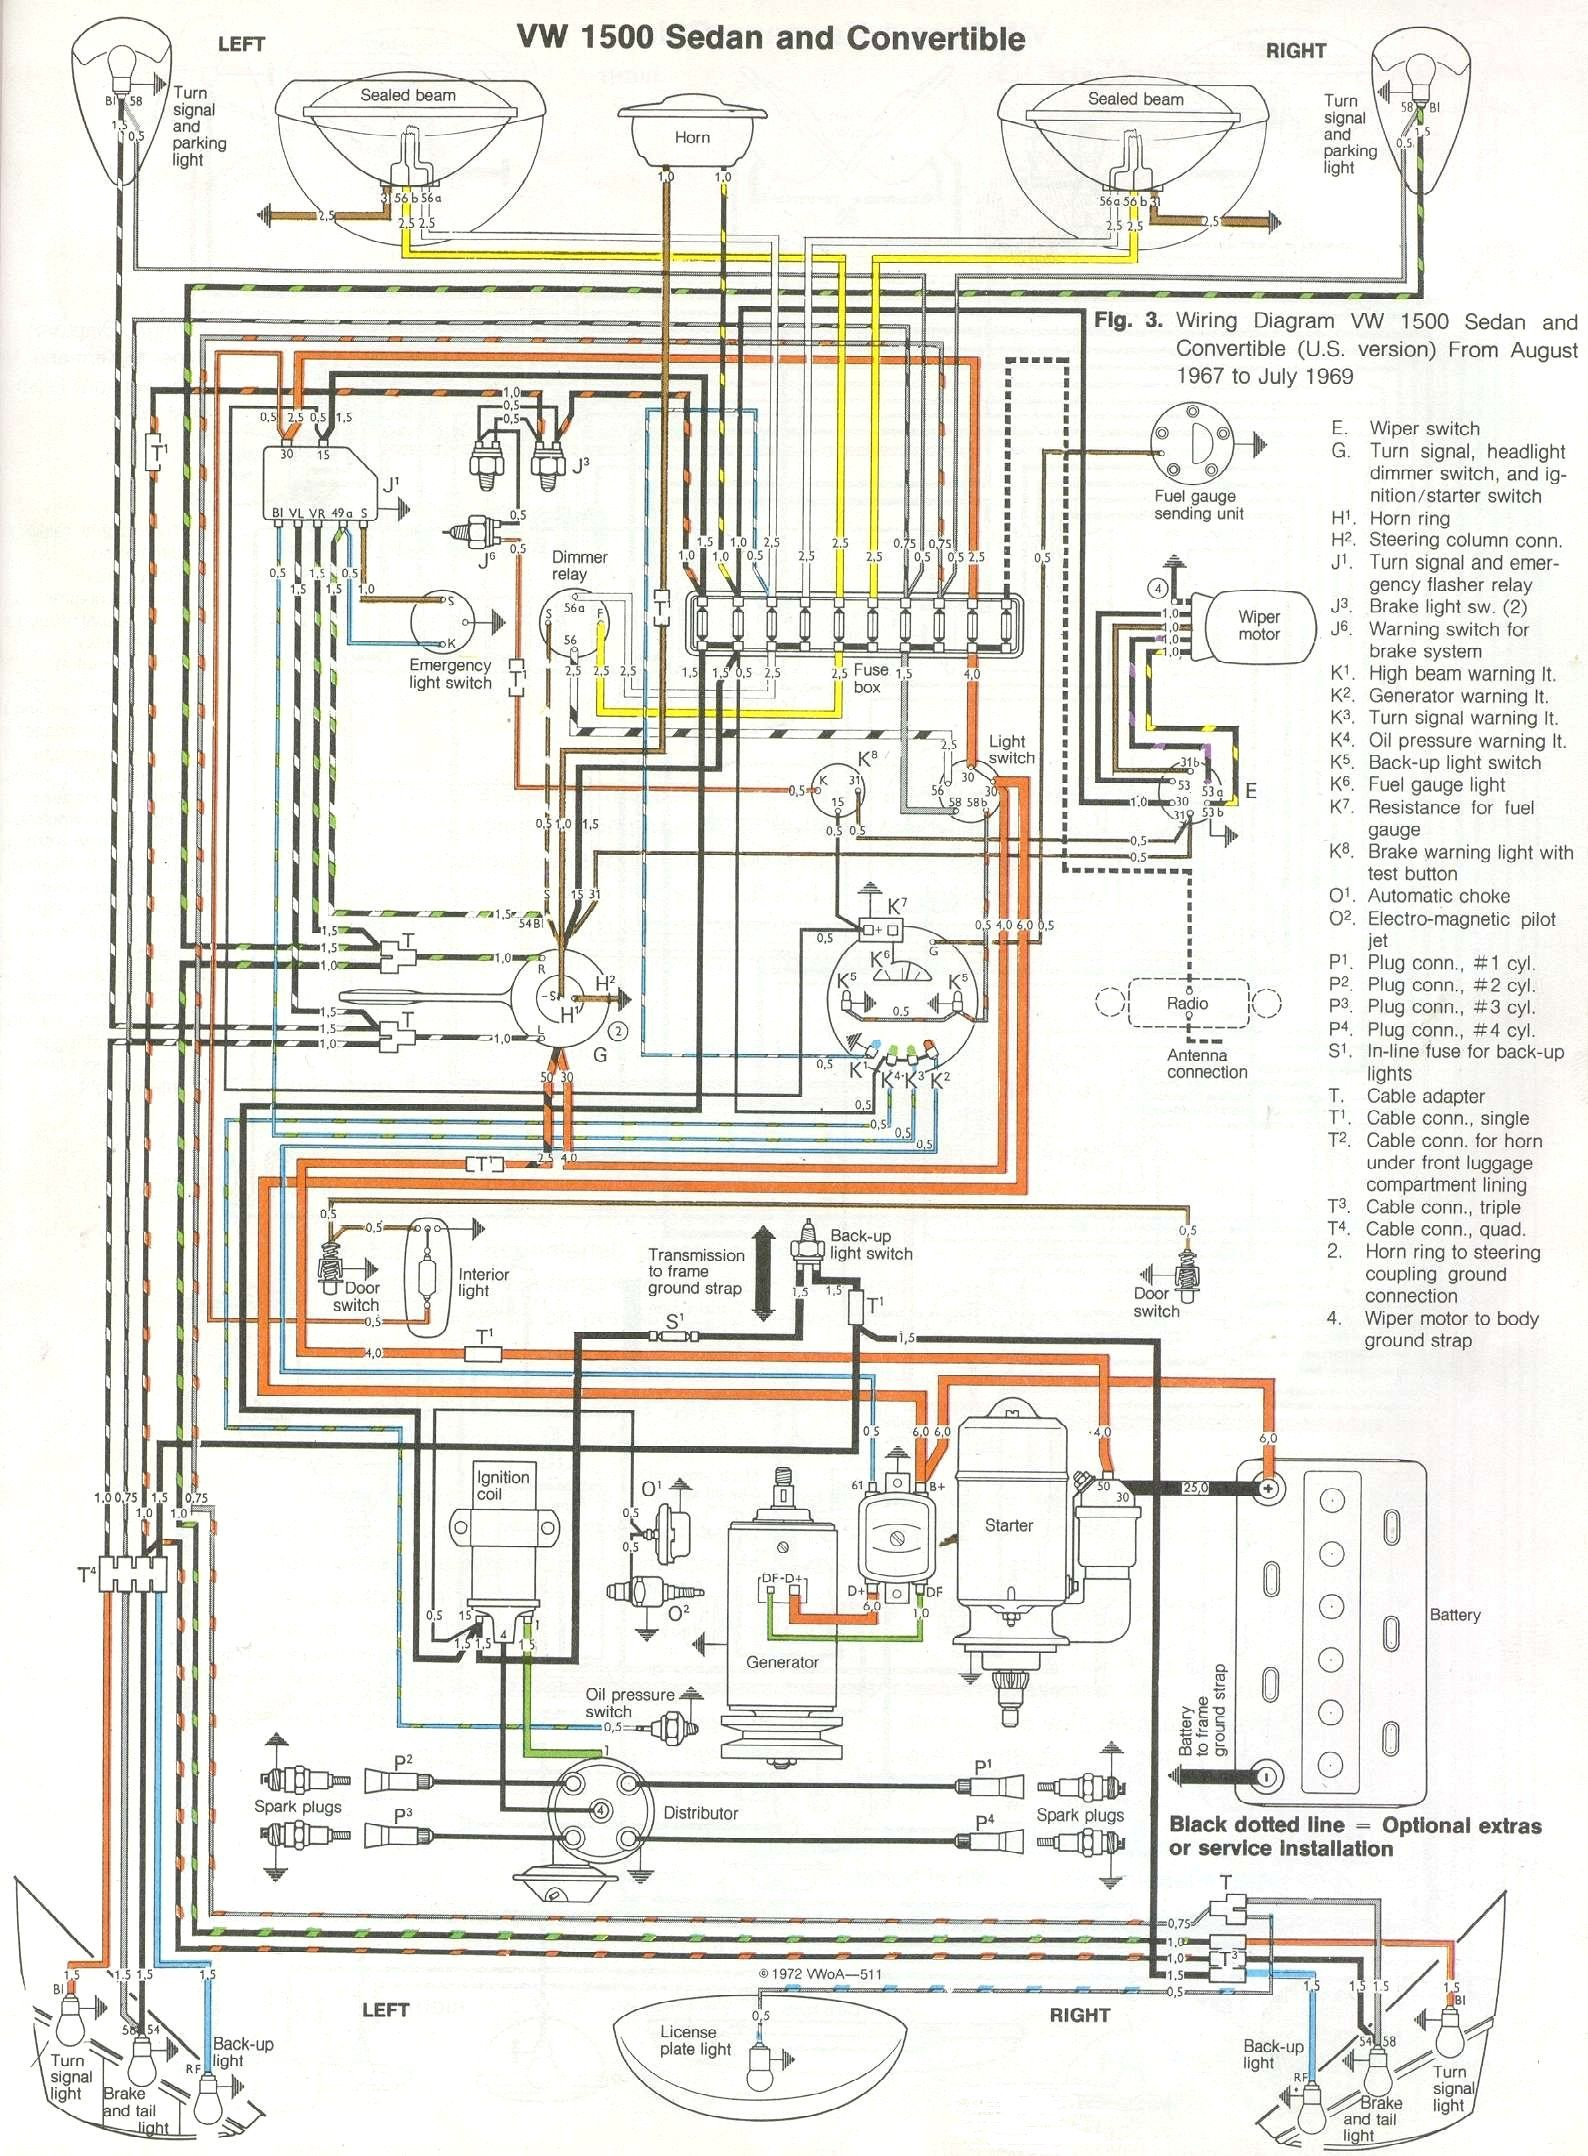 196869 Beetle Wiring Diagram (USA) | TheGoldenBug | Engine | Vw beetles, Vw trike, Volkswagen